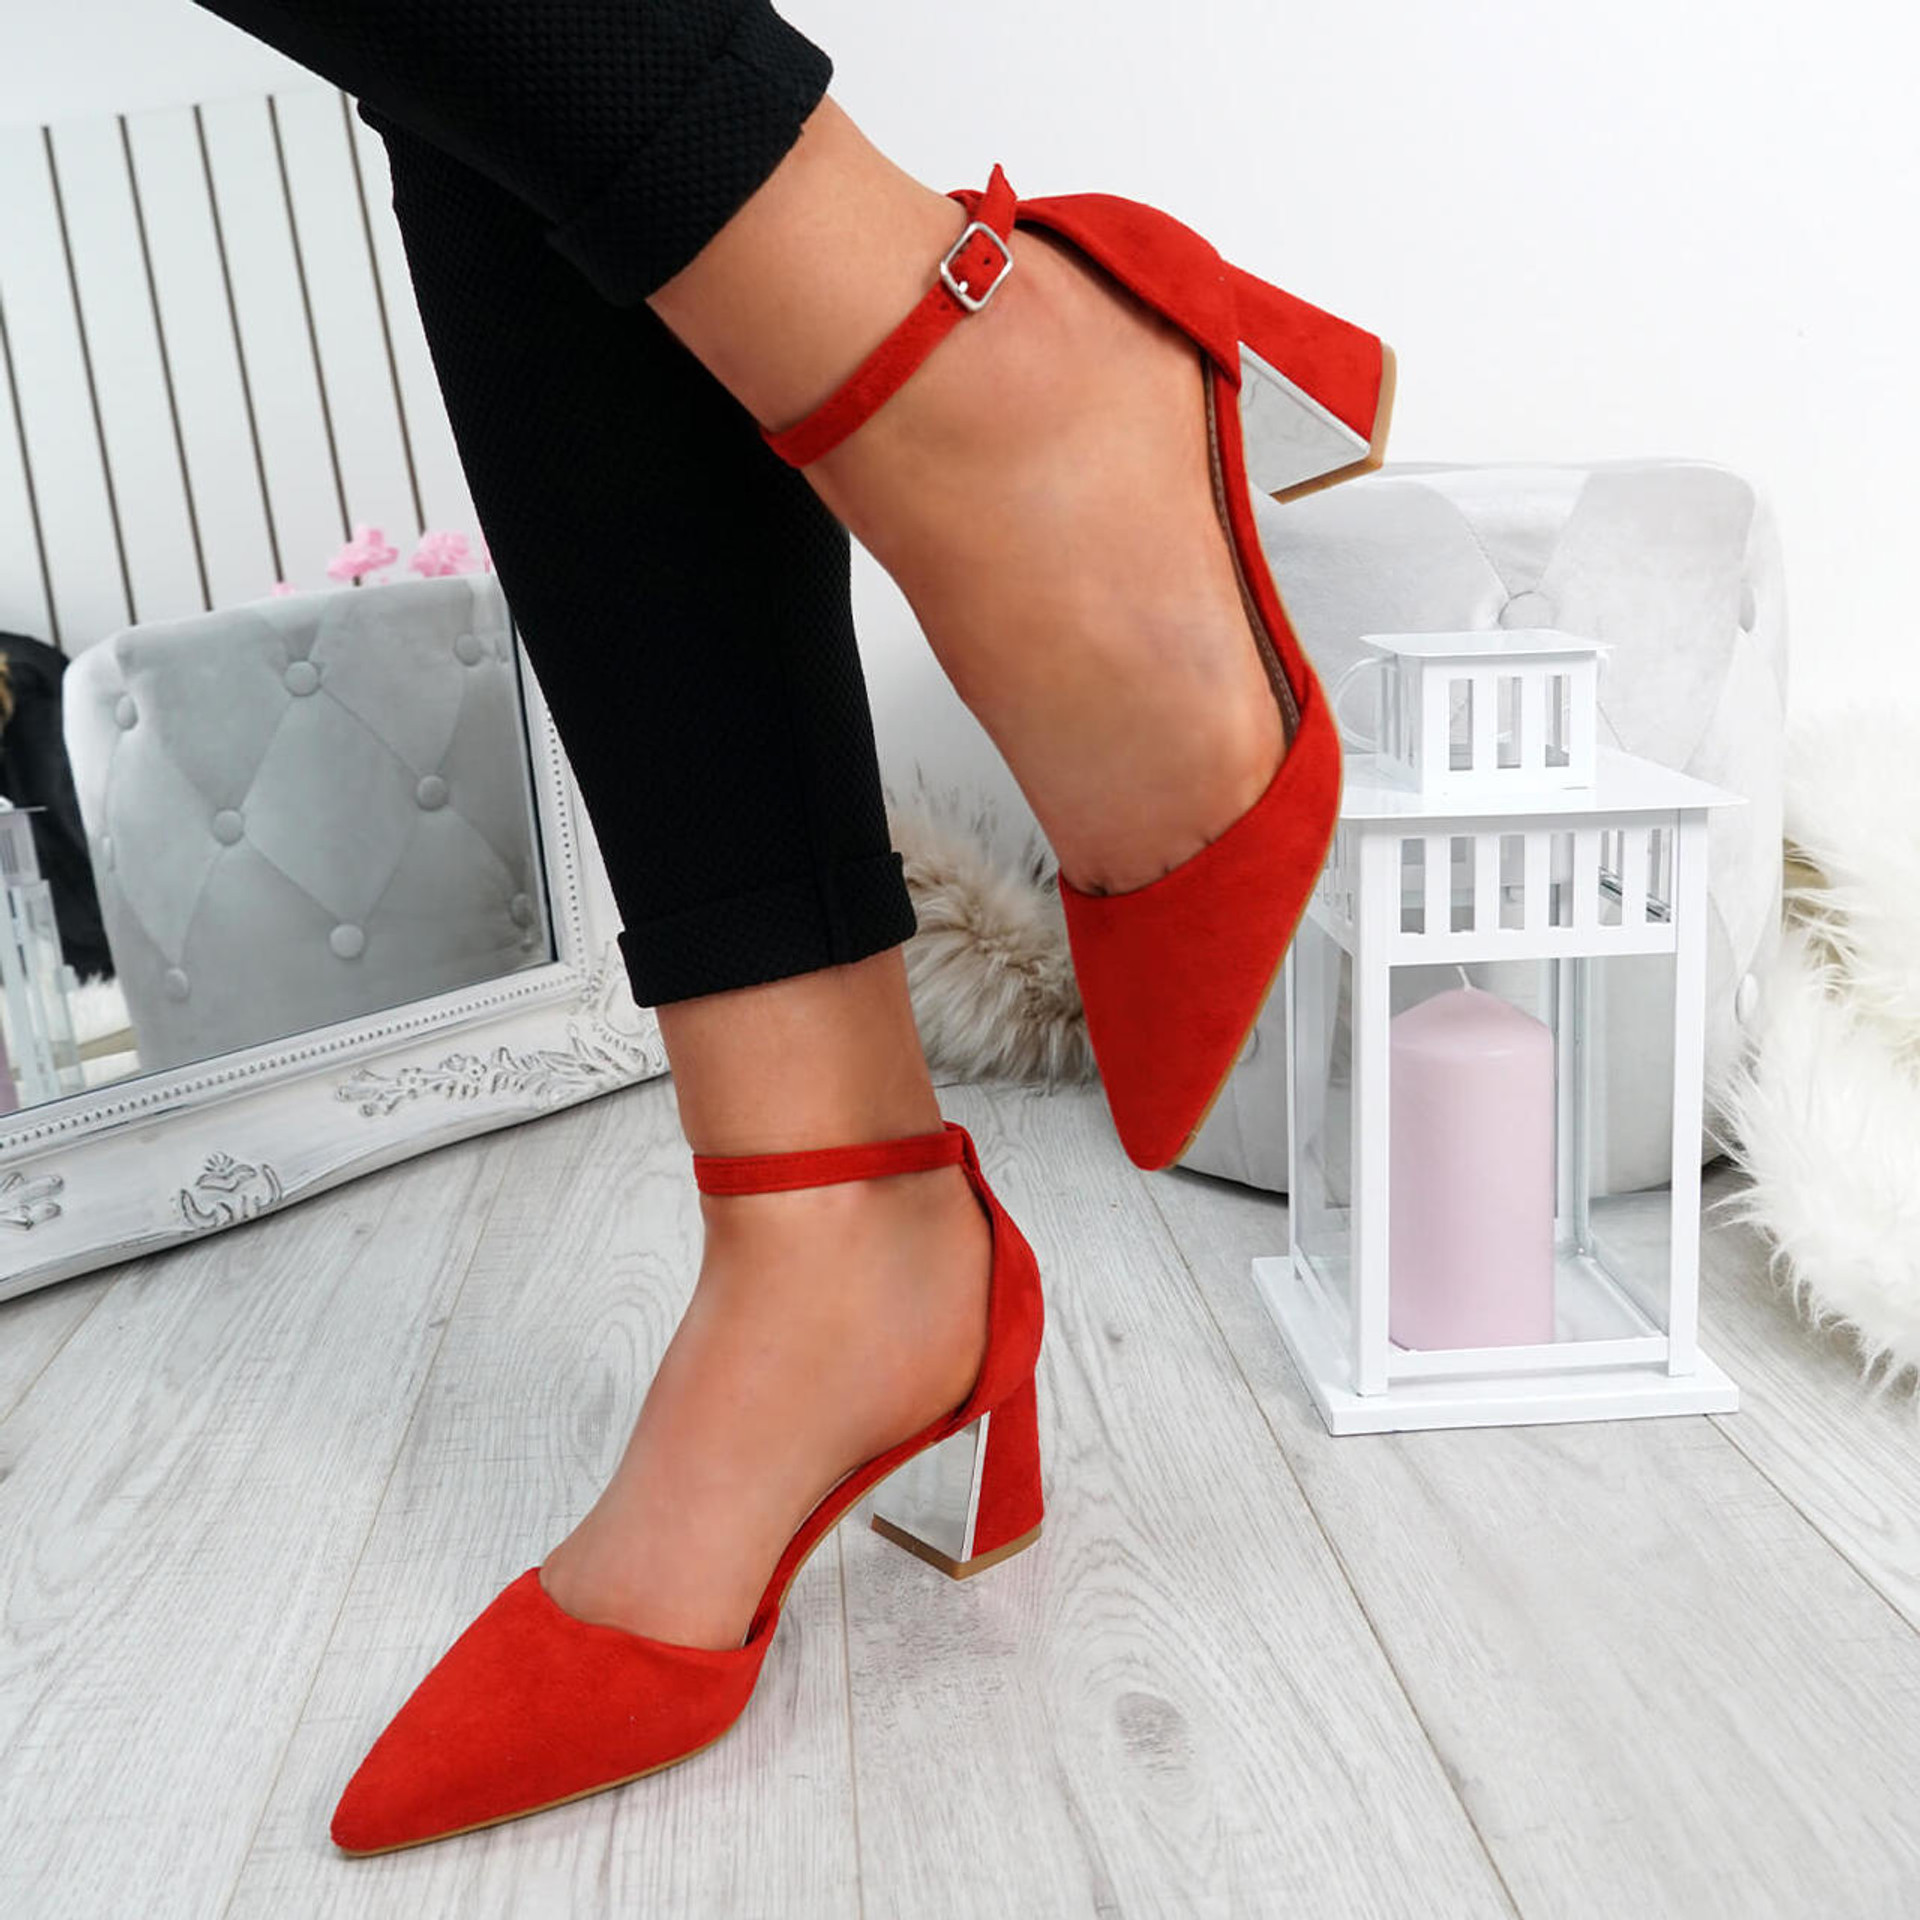 Farra Red Block Heel Pointed Pumps